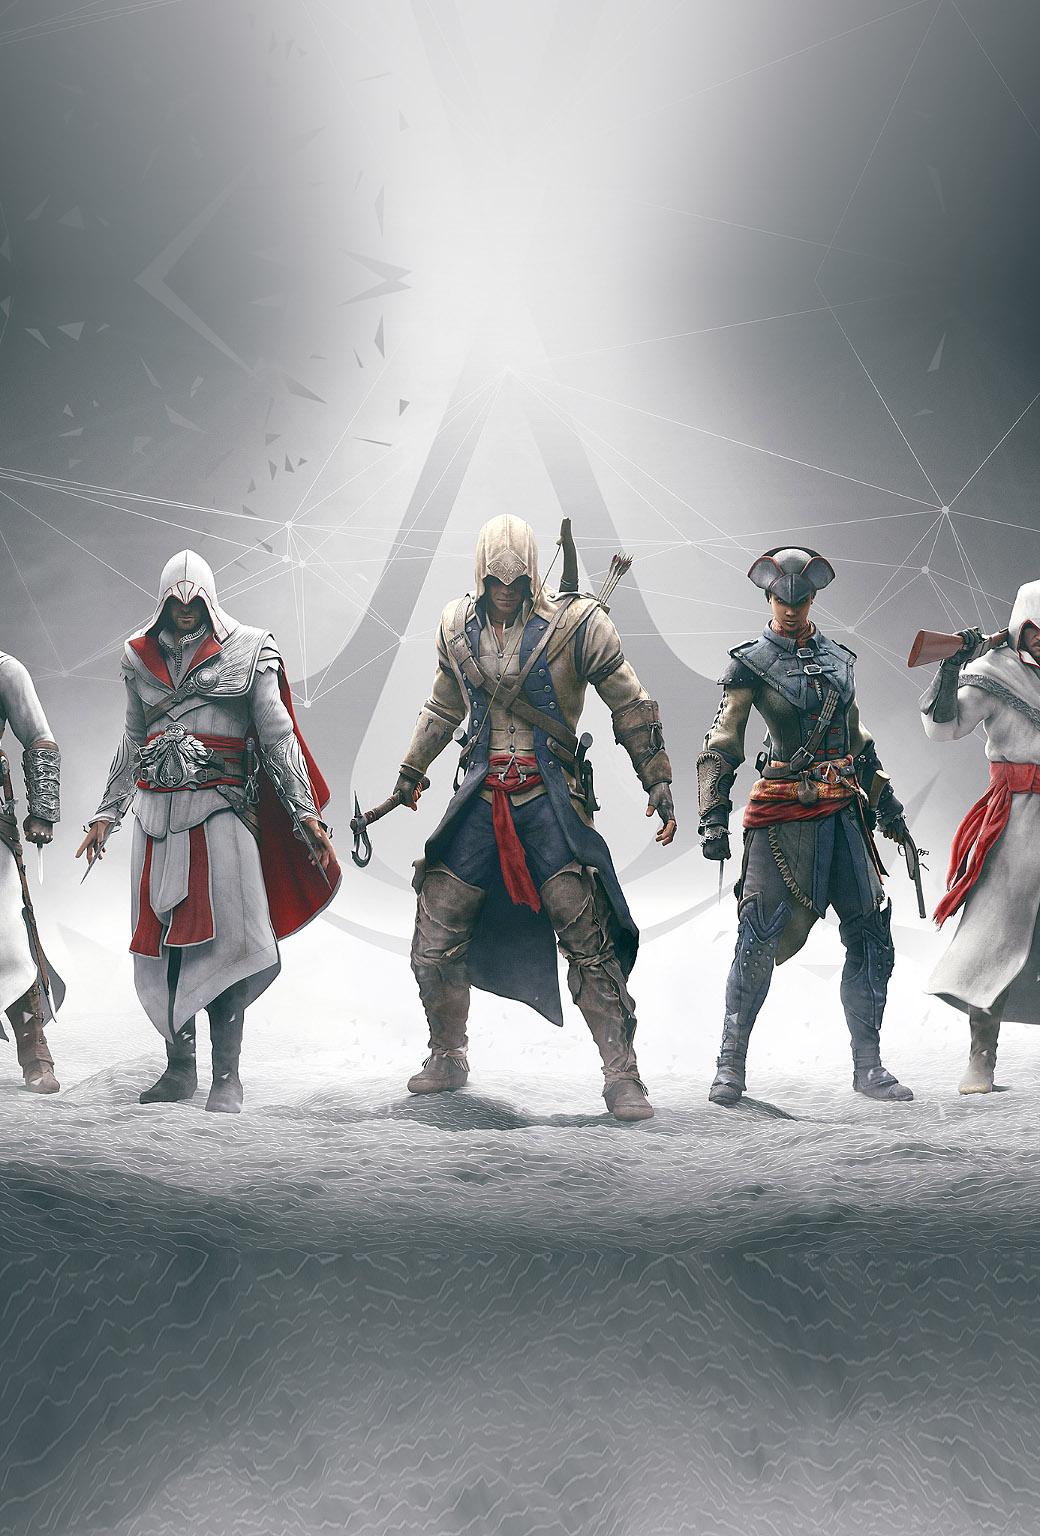 Video games wallpapers - Gaming wallpaper ...